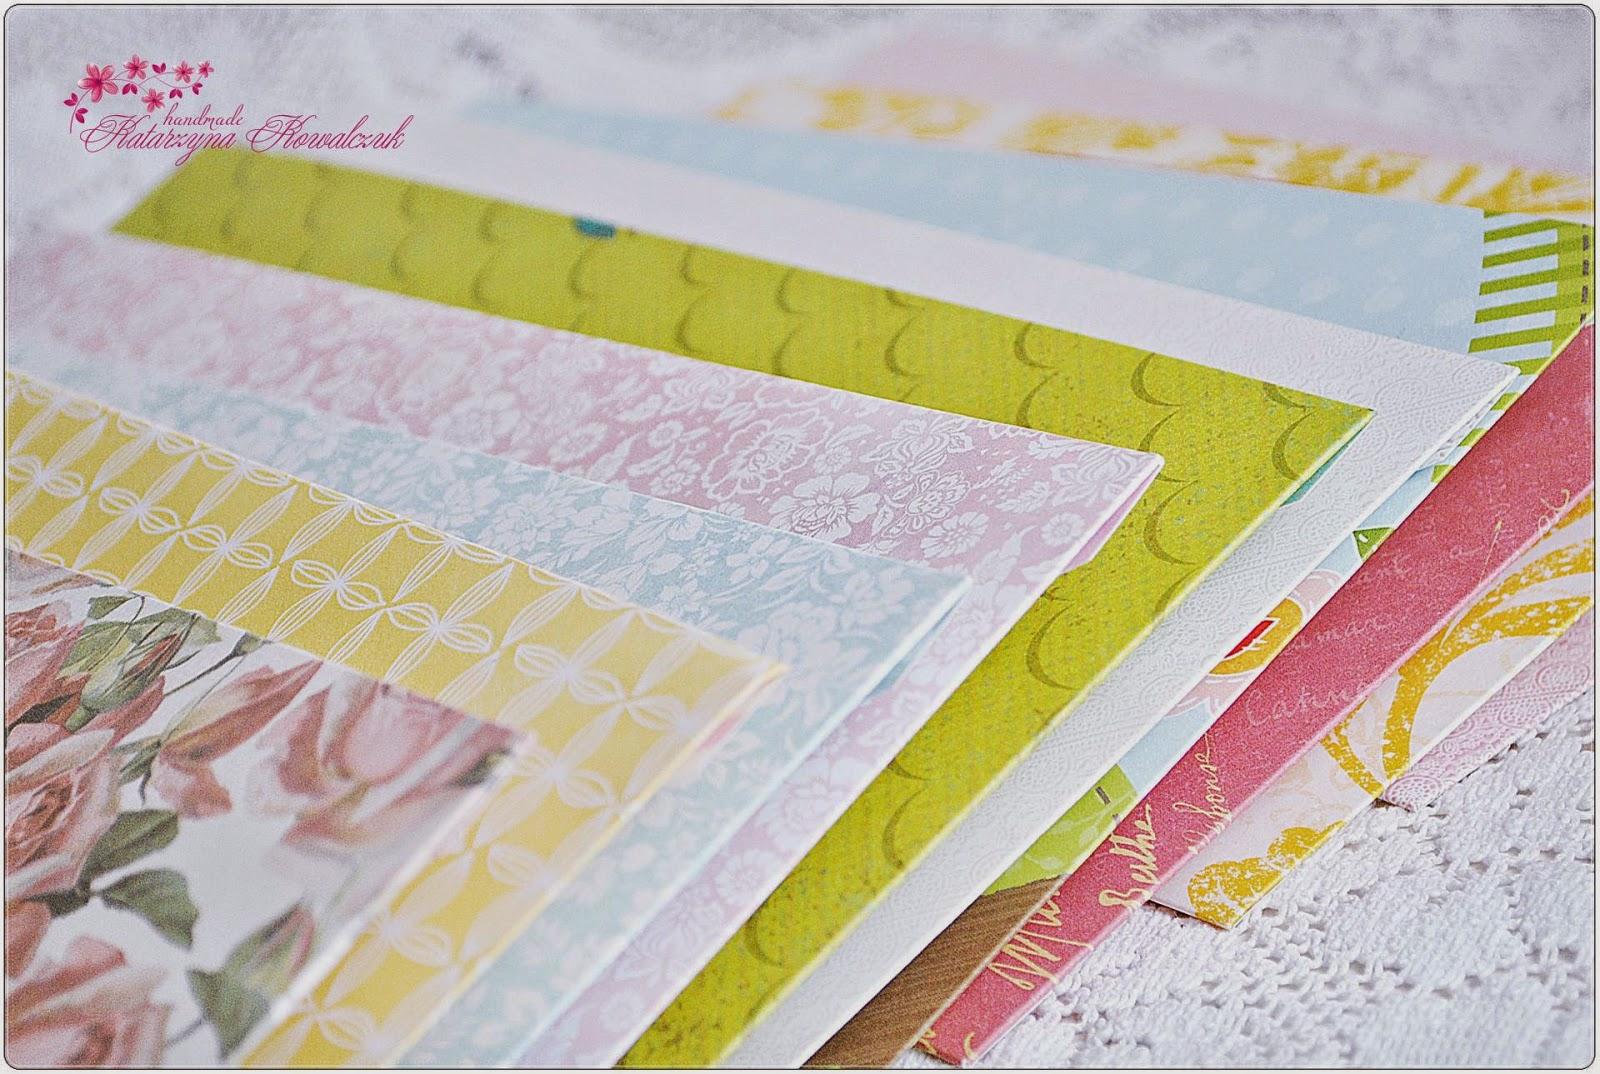 koperty na odbitki, fotografia, scrapbooking